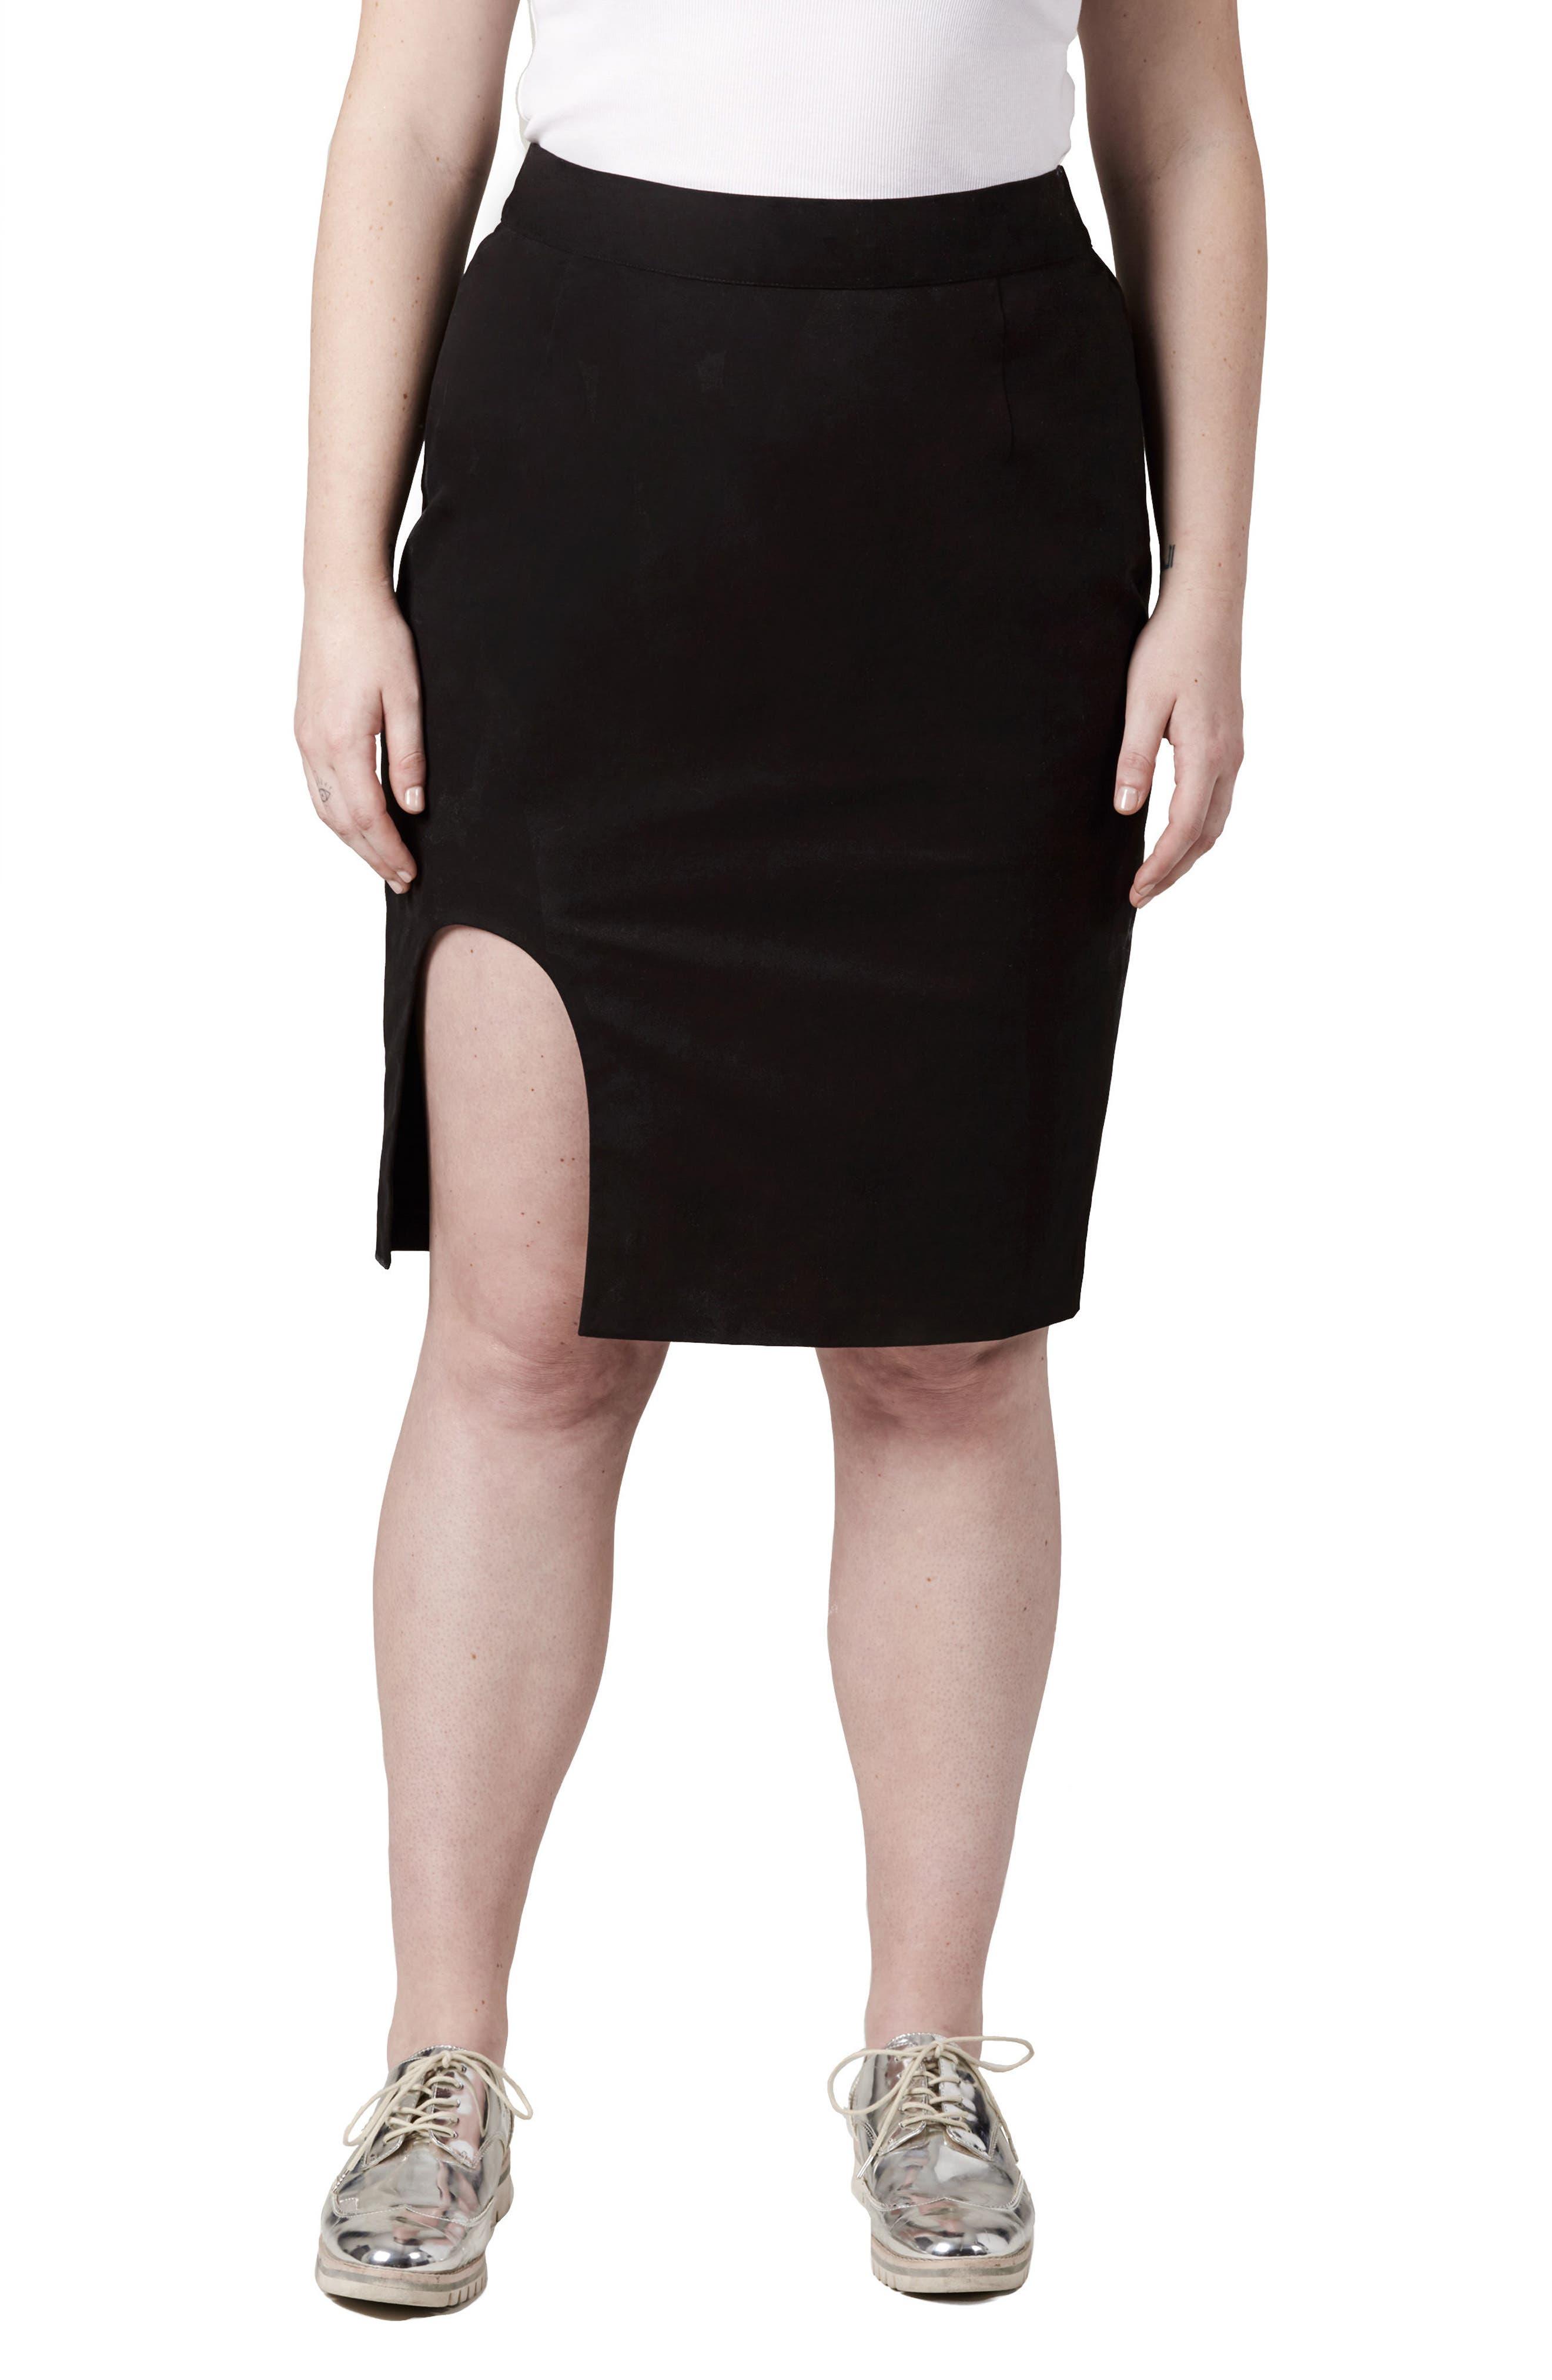 Alternate Image 1 Selected - UNIVERSAL STANDARD Unity Cutout Skirt (Plus Size)